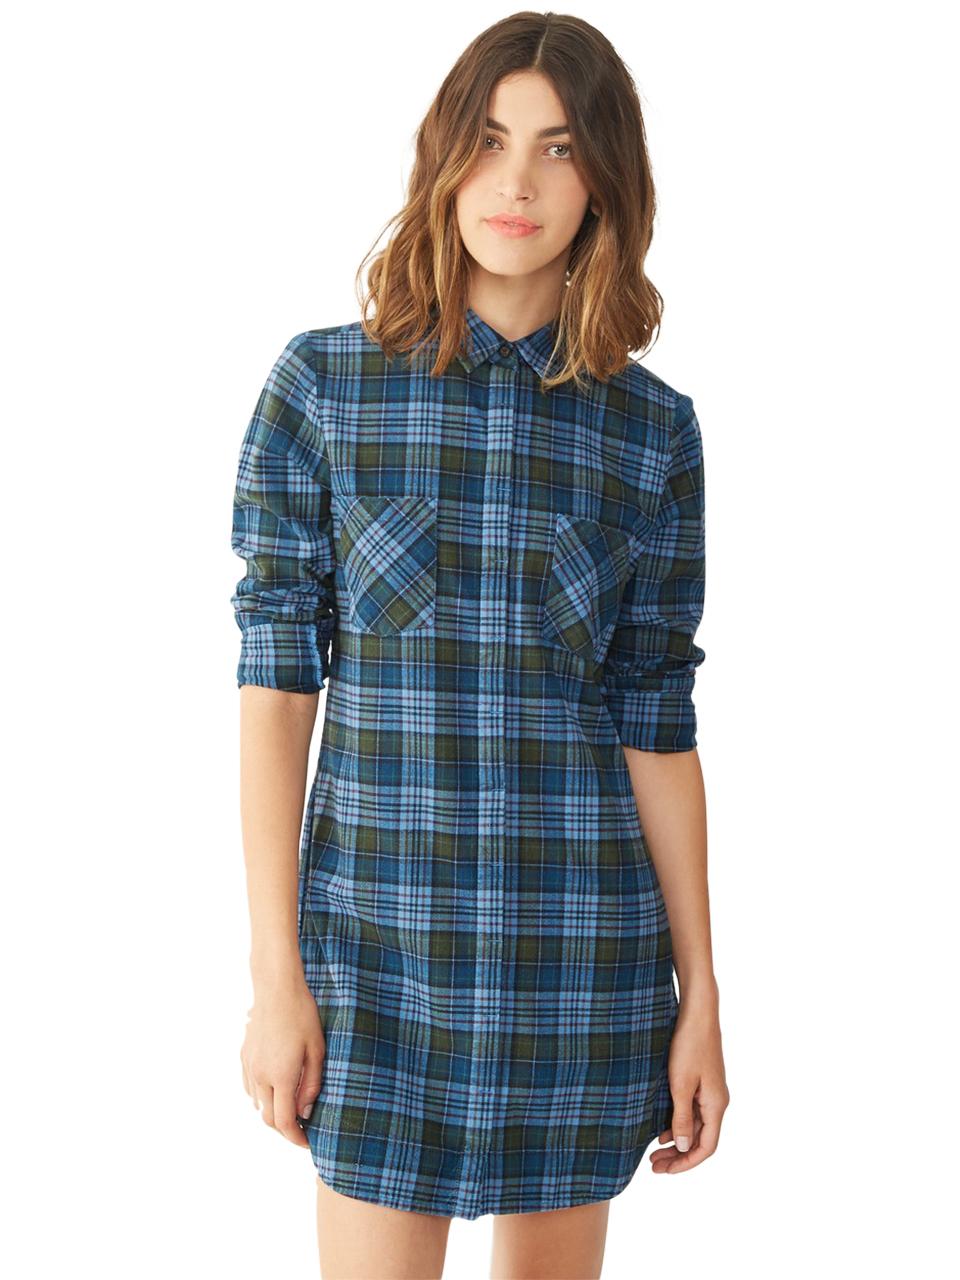 Lyst - Alternative Apparel Flannel Shirt Dress in Gray